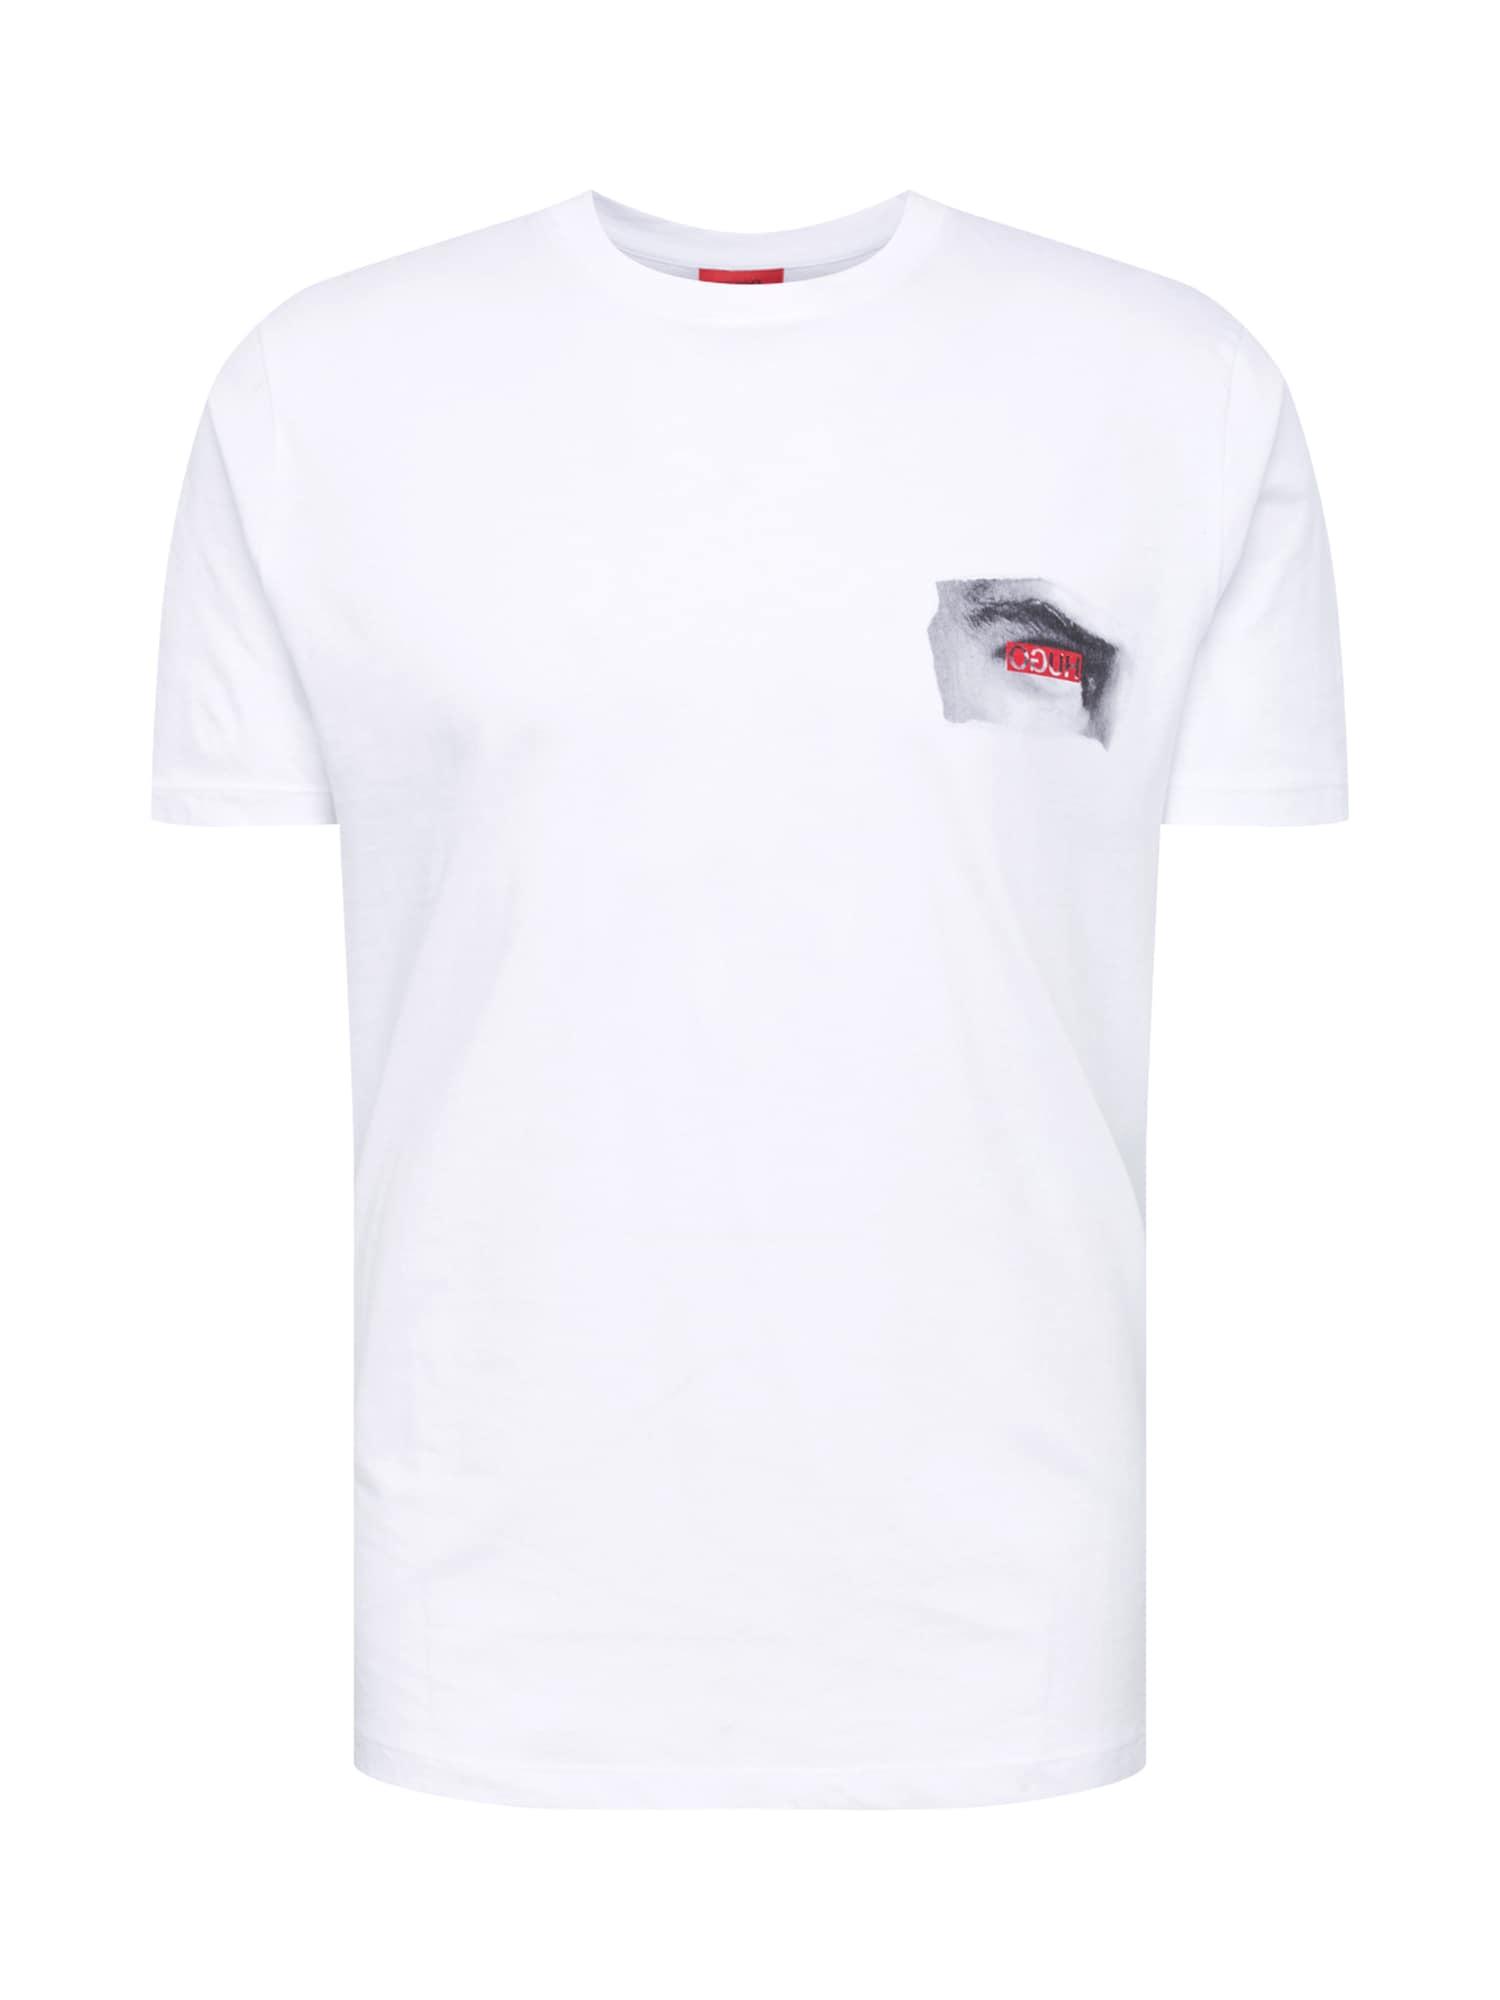 Tričko Deye bílá HUGO